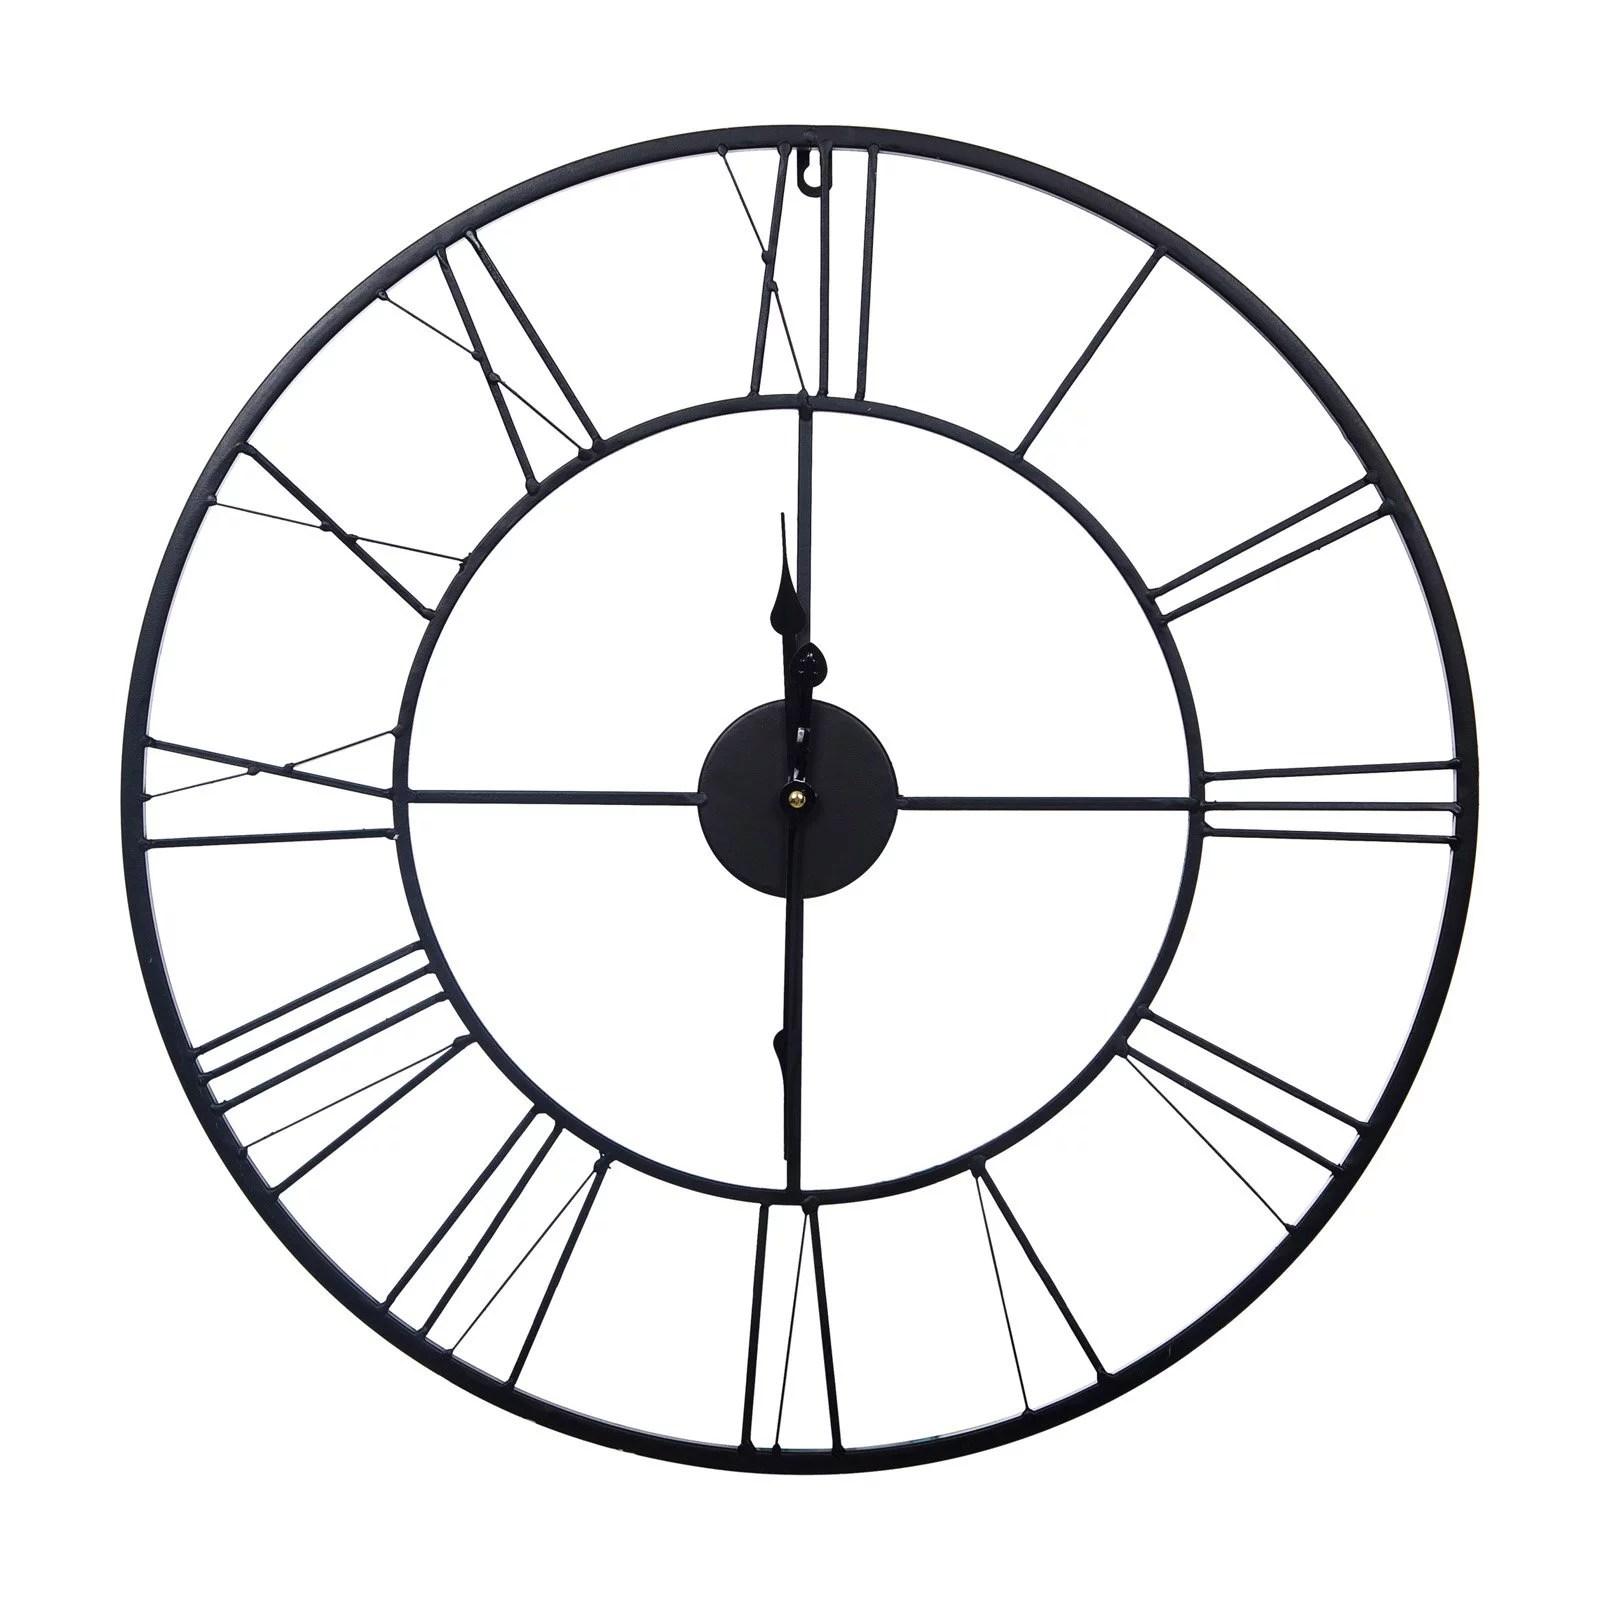 24 Metal Cutout Roman Numeral Wall Clock